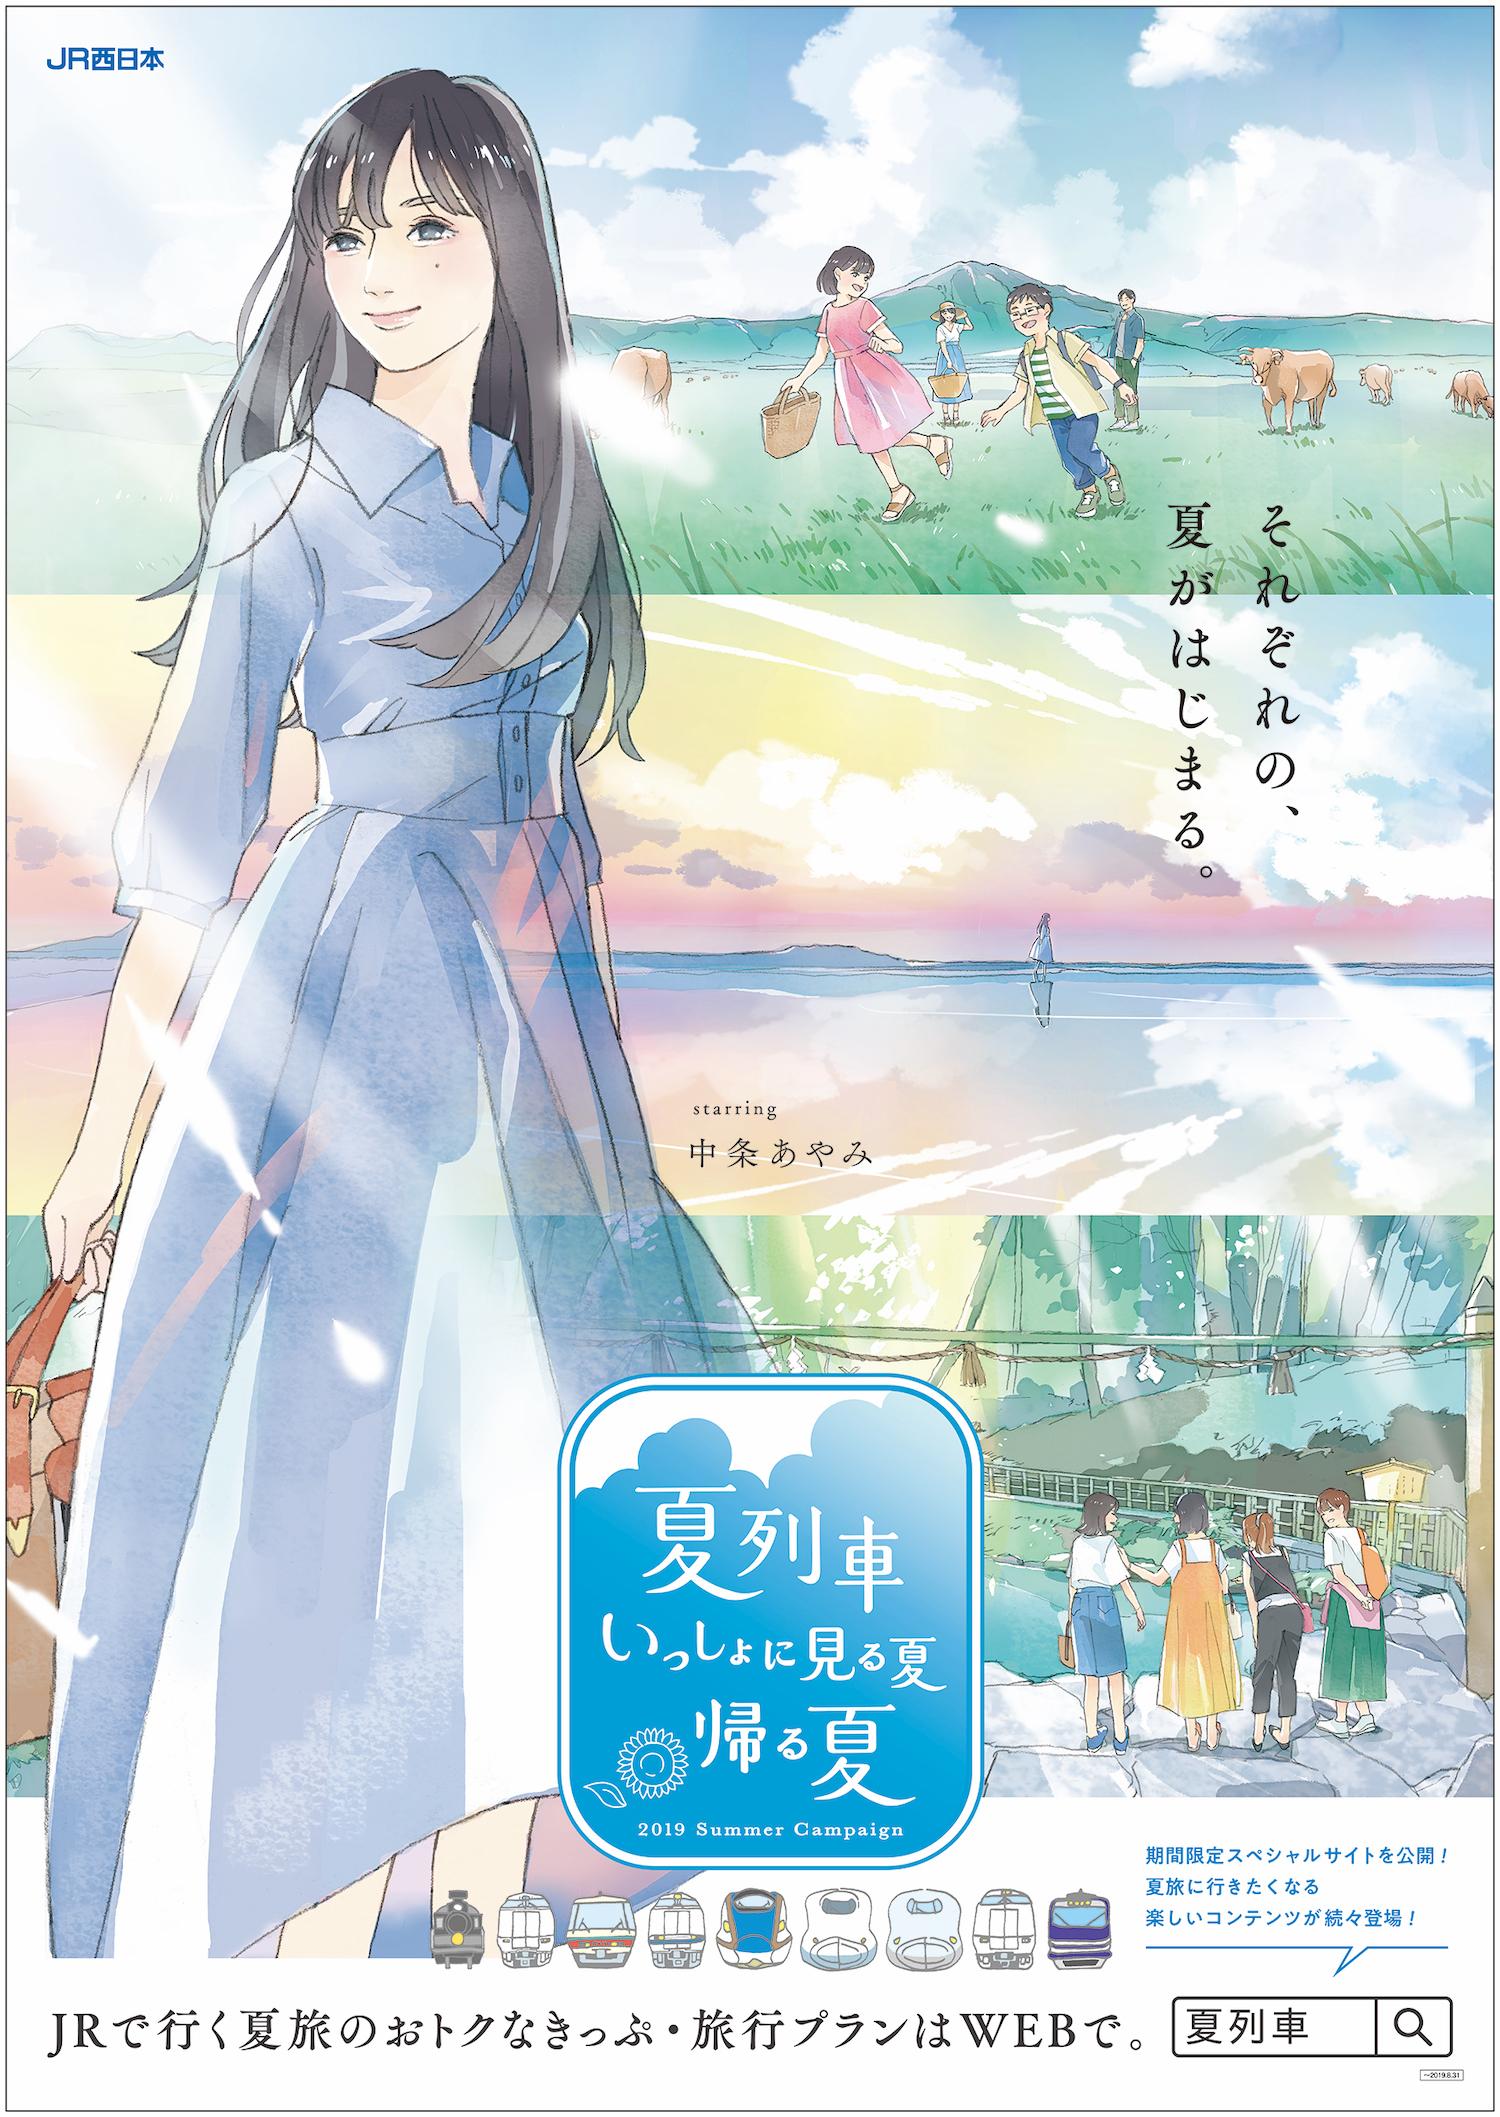 JR西日本CM『夏列車 いっしょに見る夏 帰る夏』